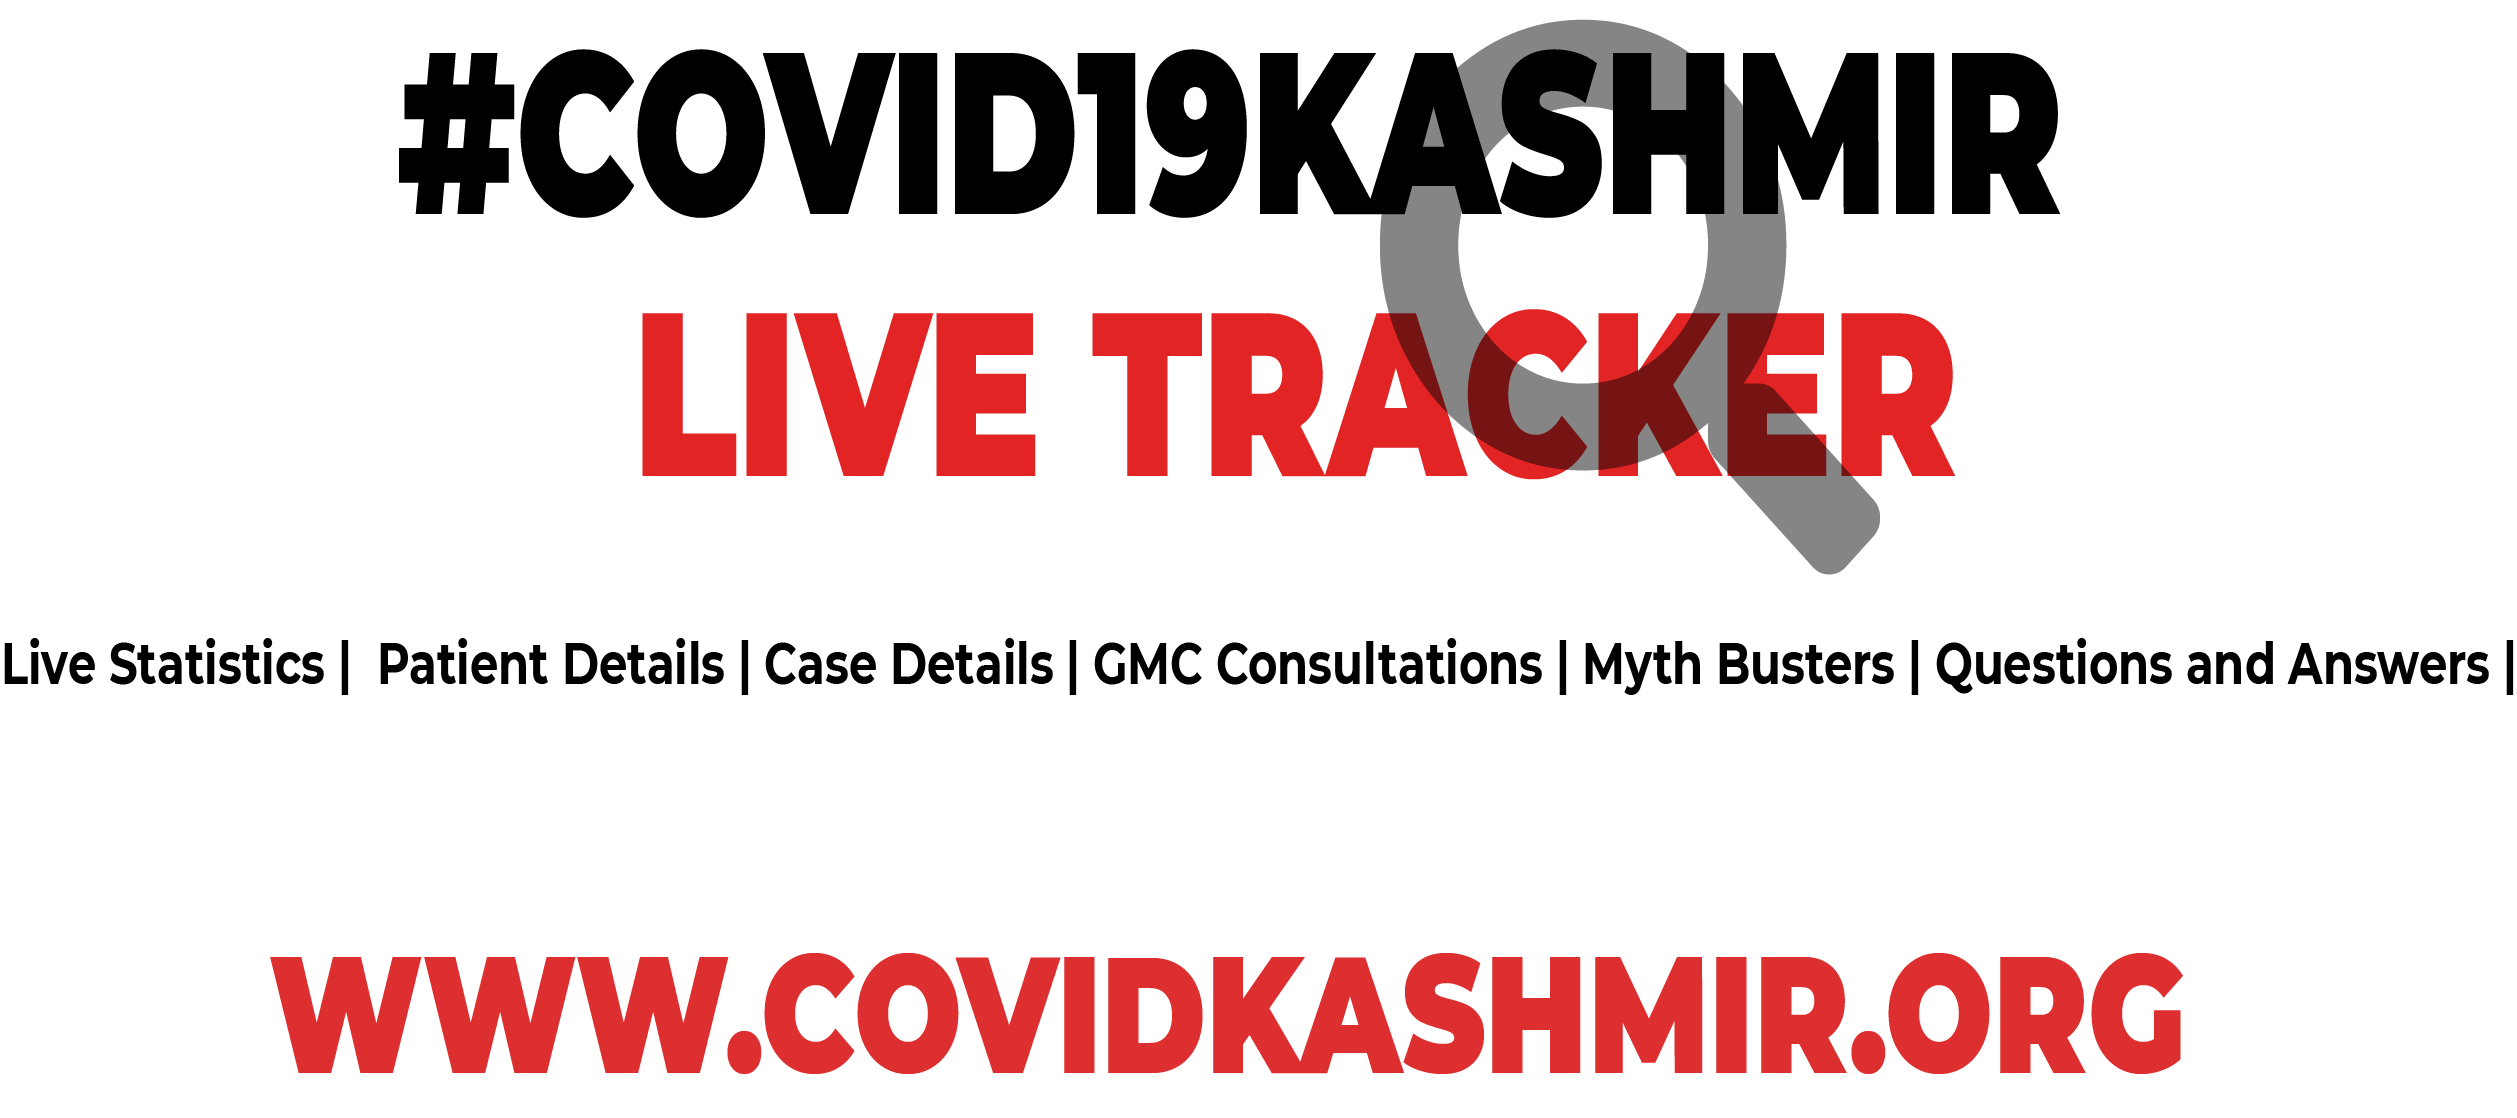 Covid-19 Kashmir Tracker